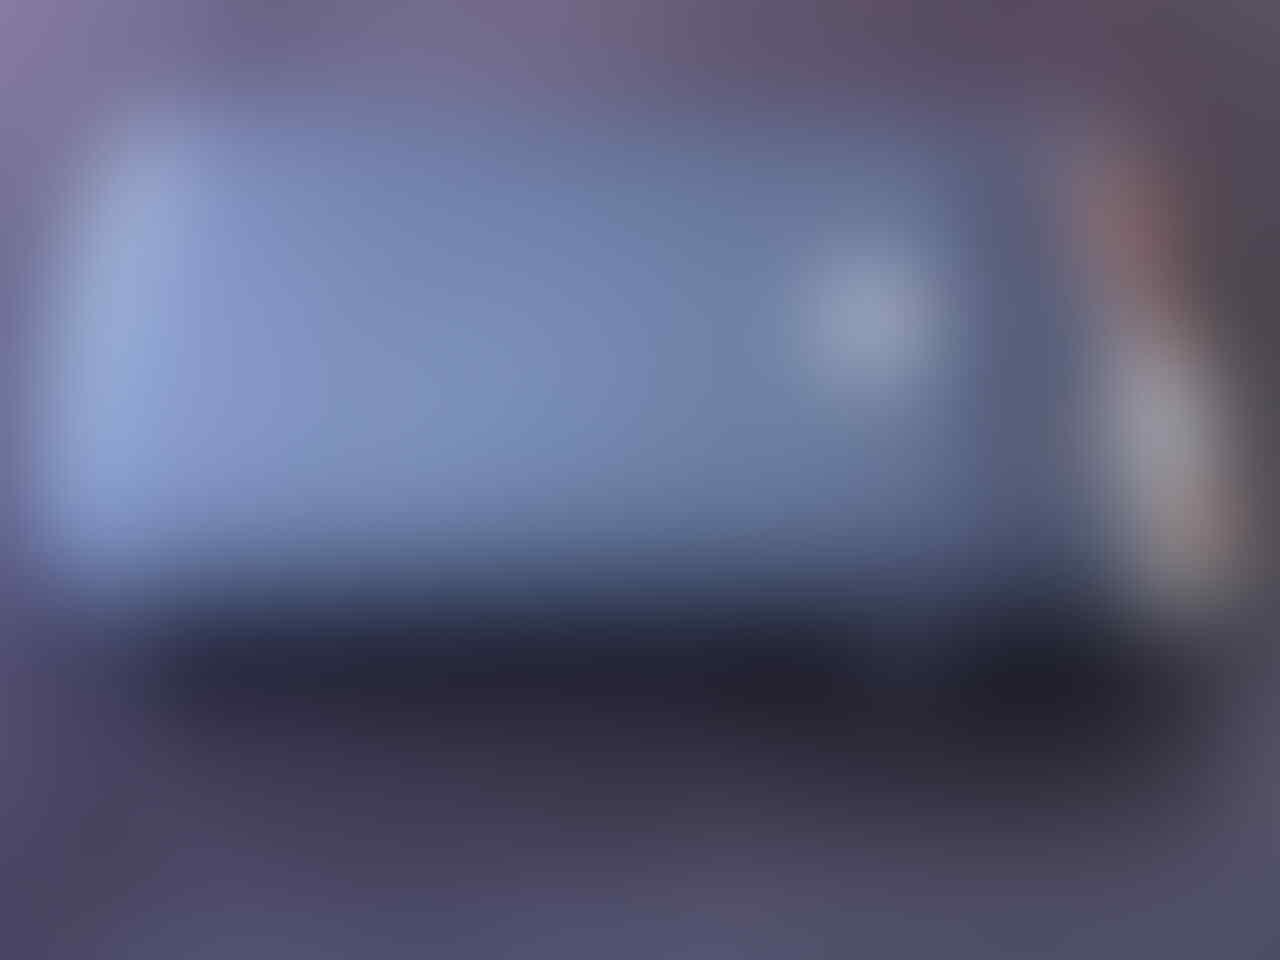 JUAL Blackberry 9700 onyx 1 Black mulus 95%, lengkap garansi panjaaaaaaaaanngg